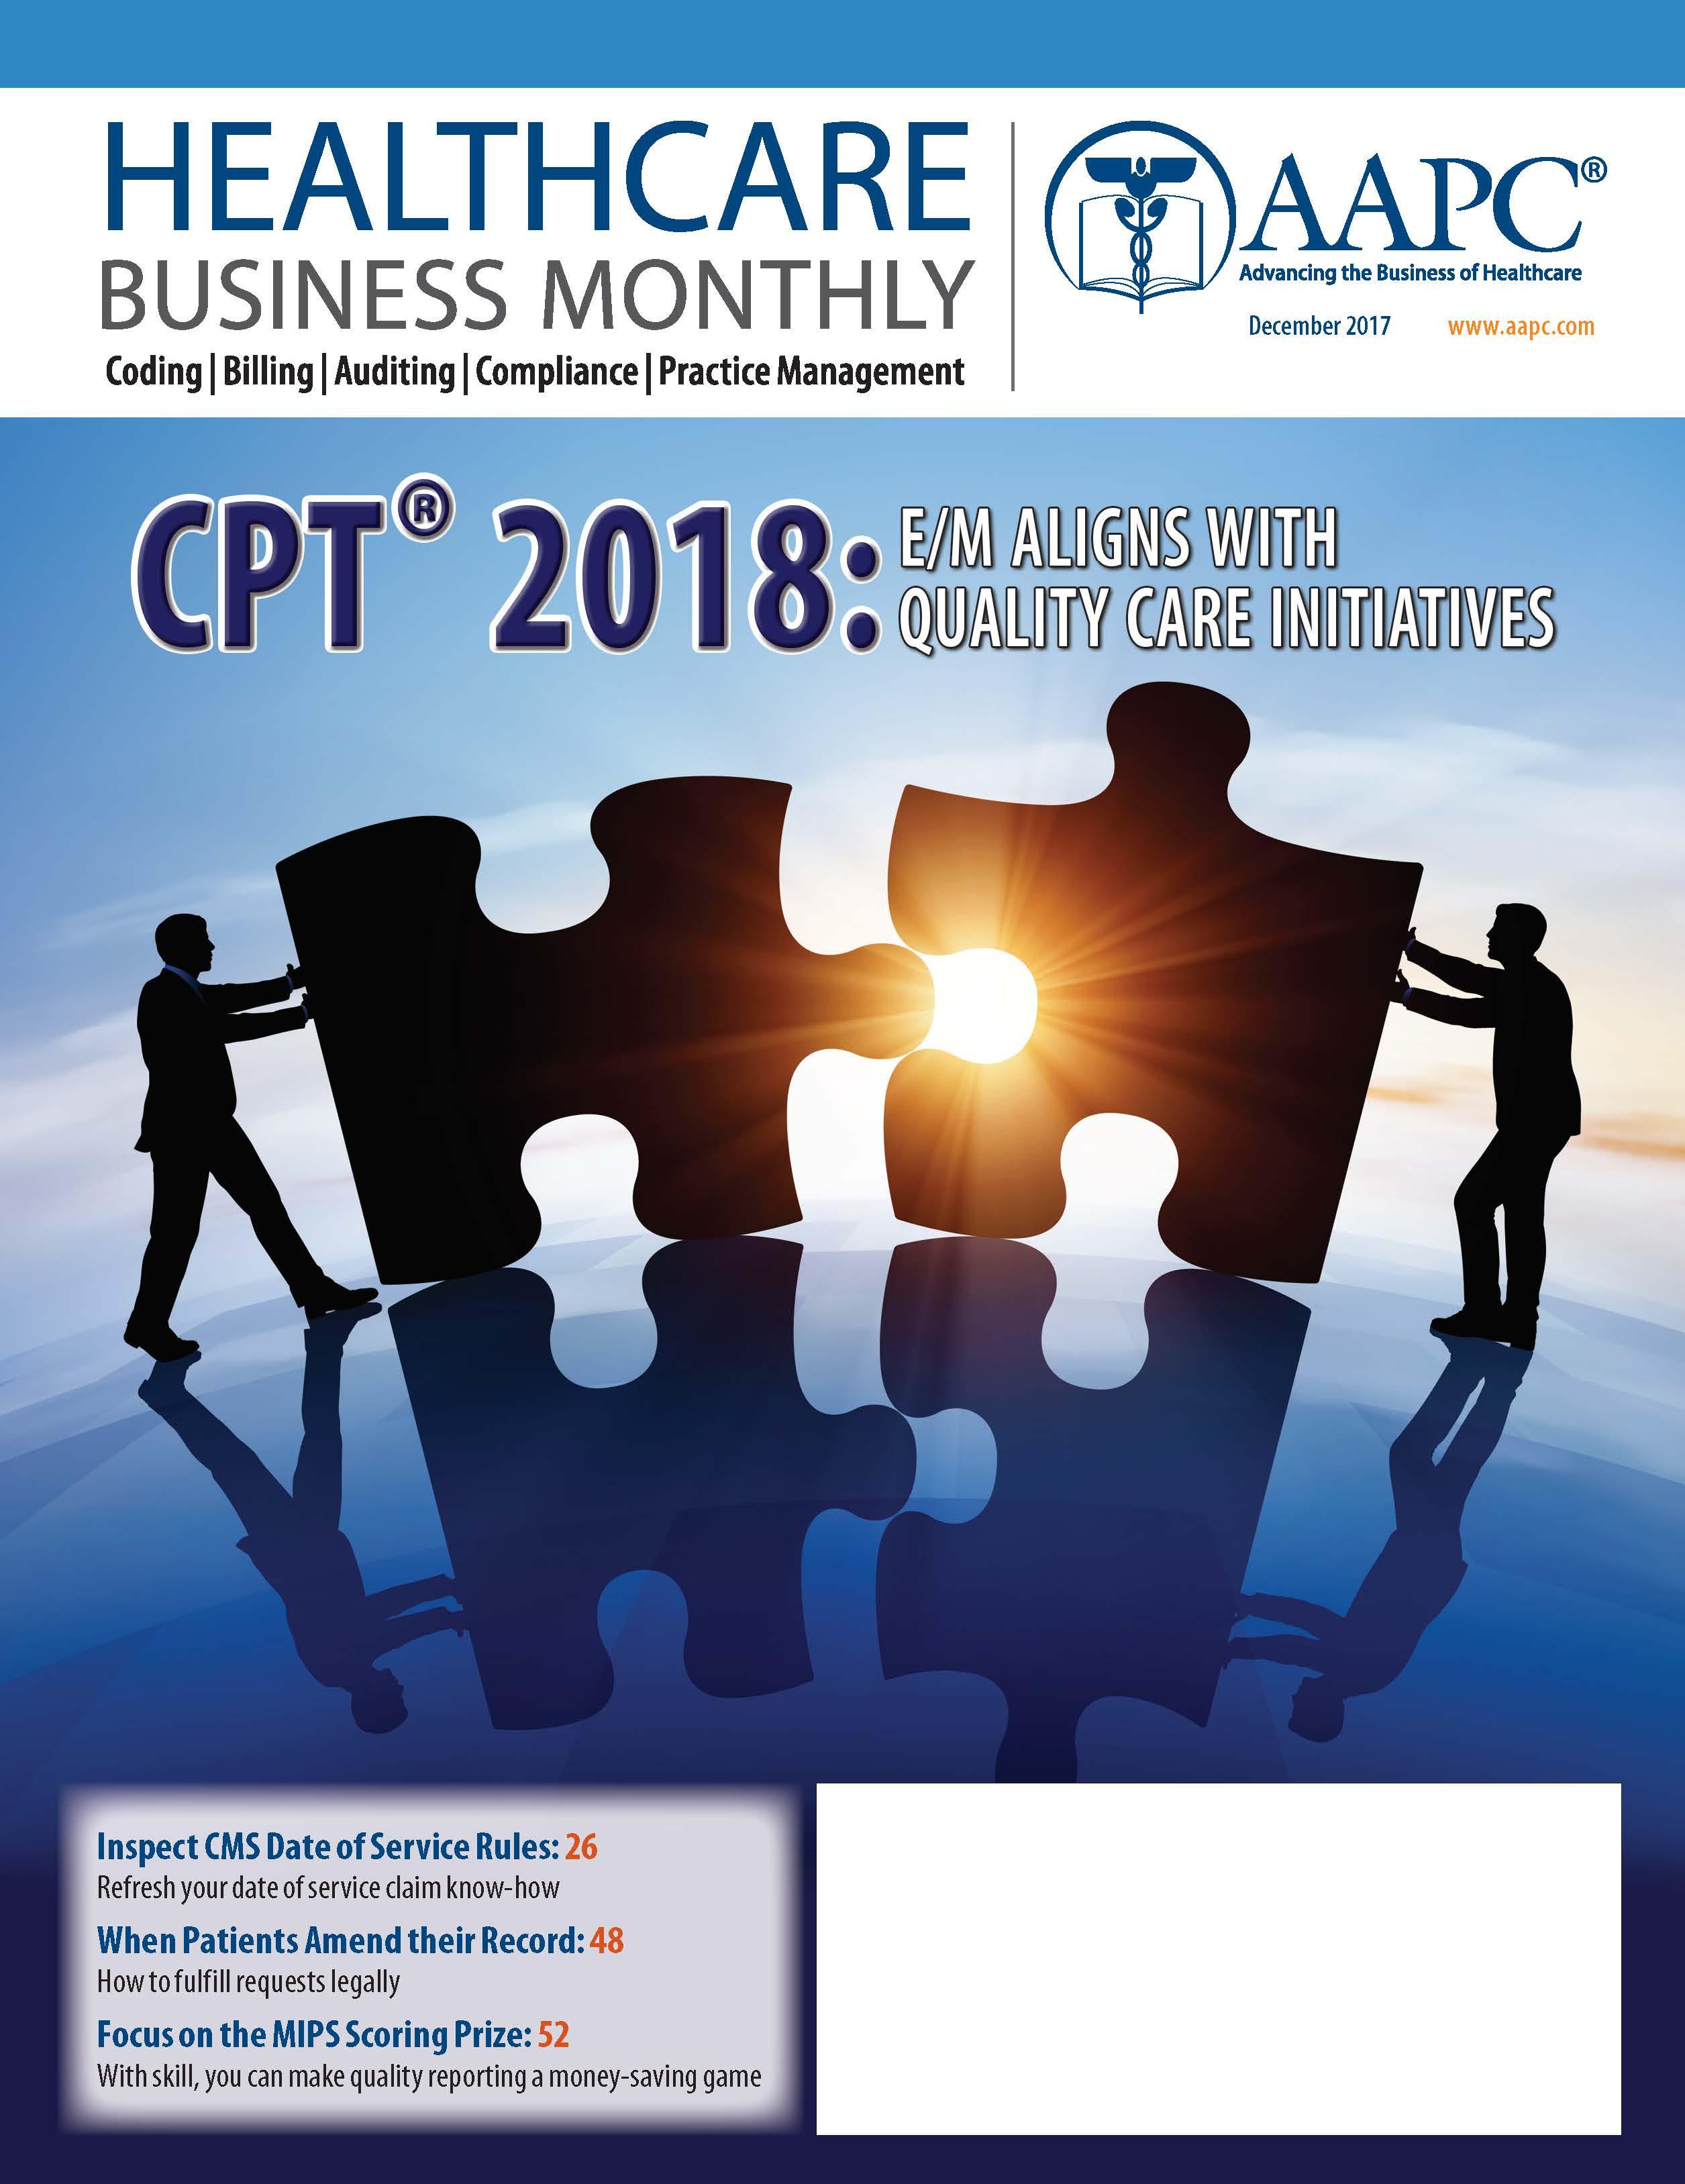 Healthcare Business Magazine